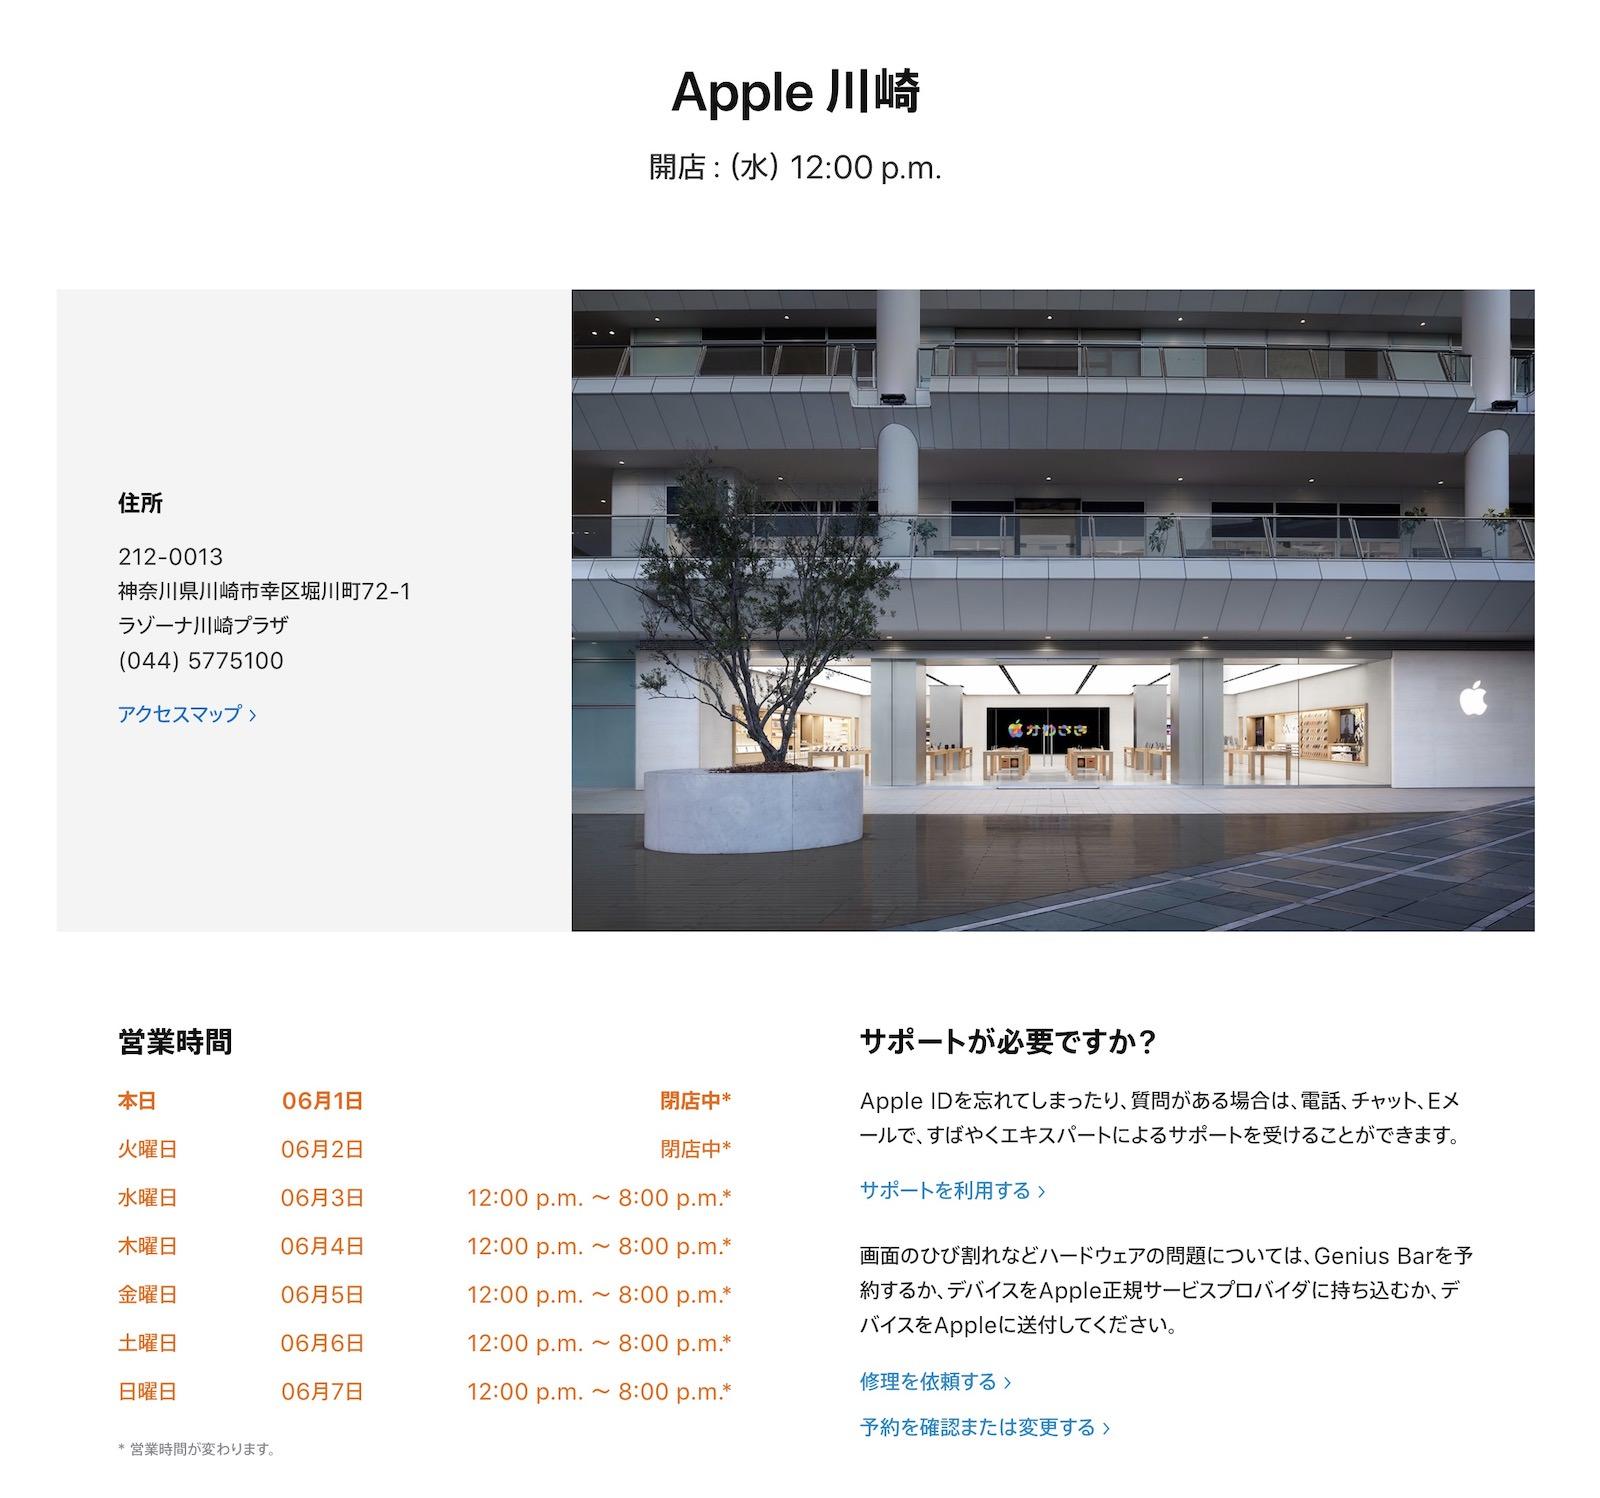 Apple Kawasaki Hours